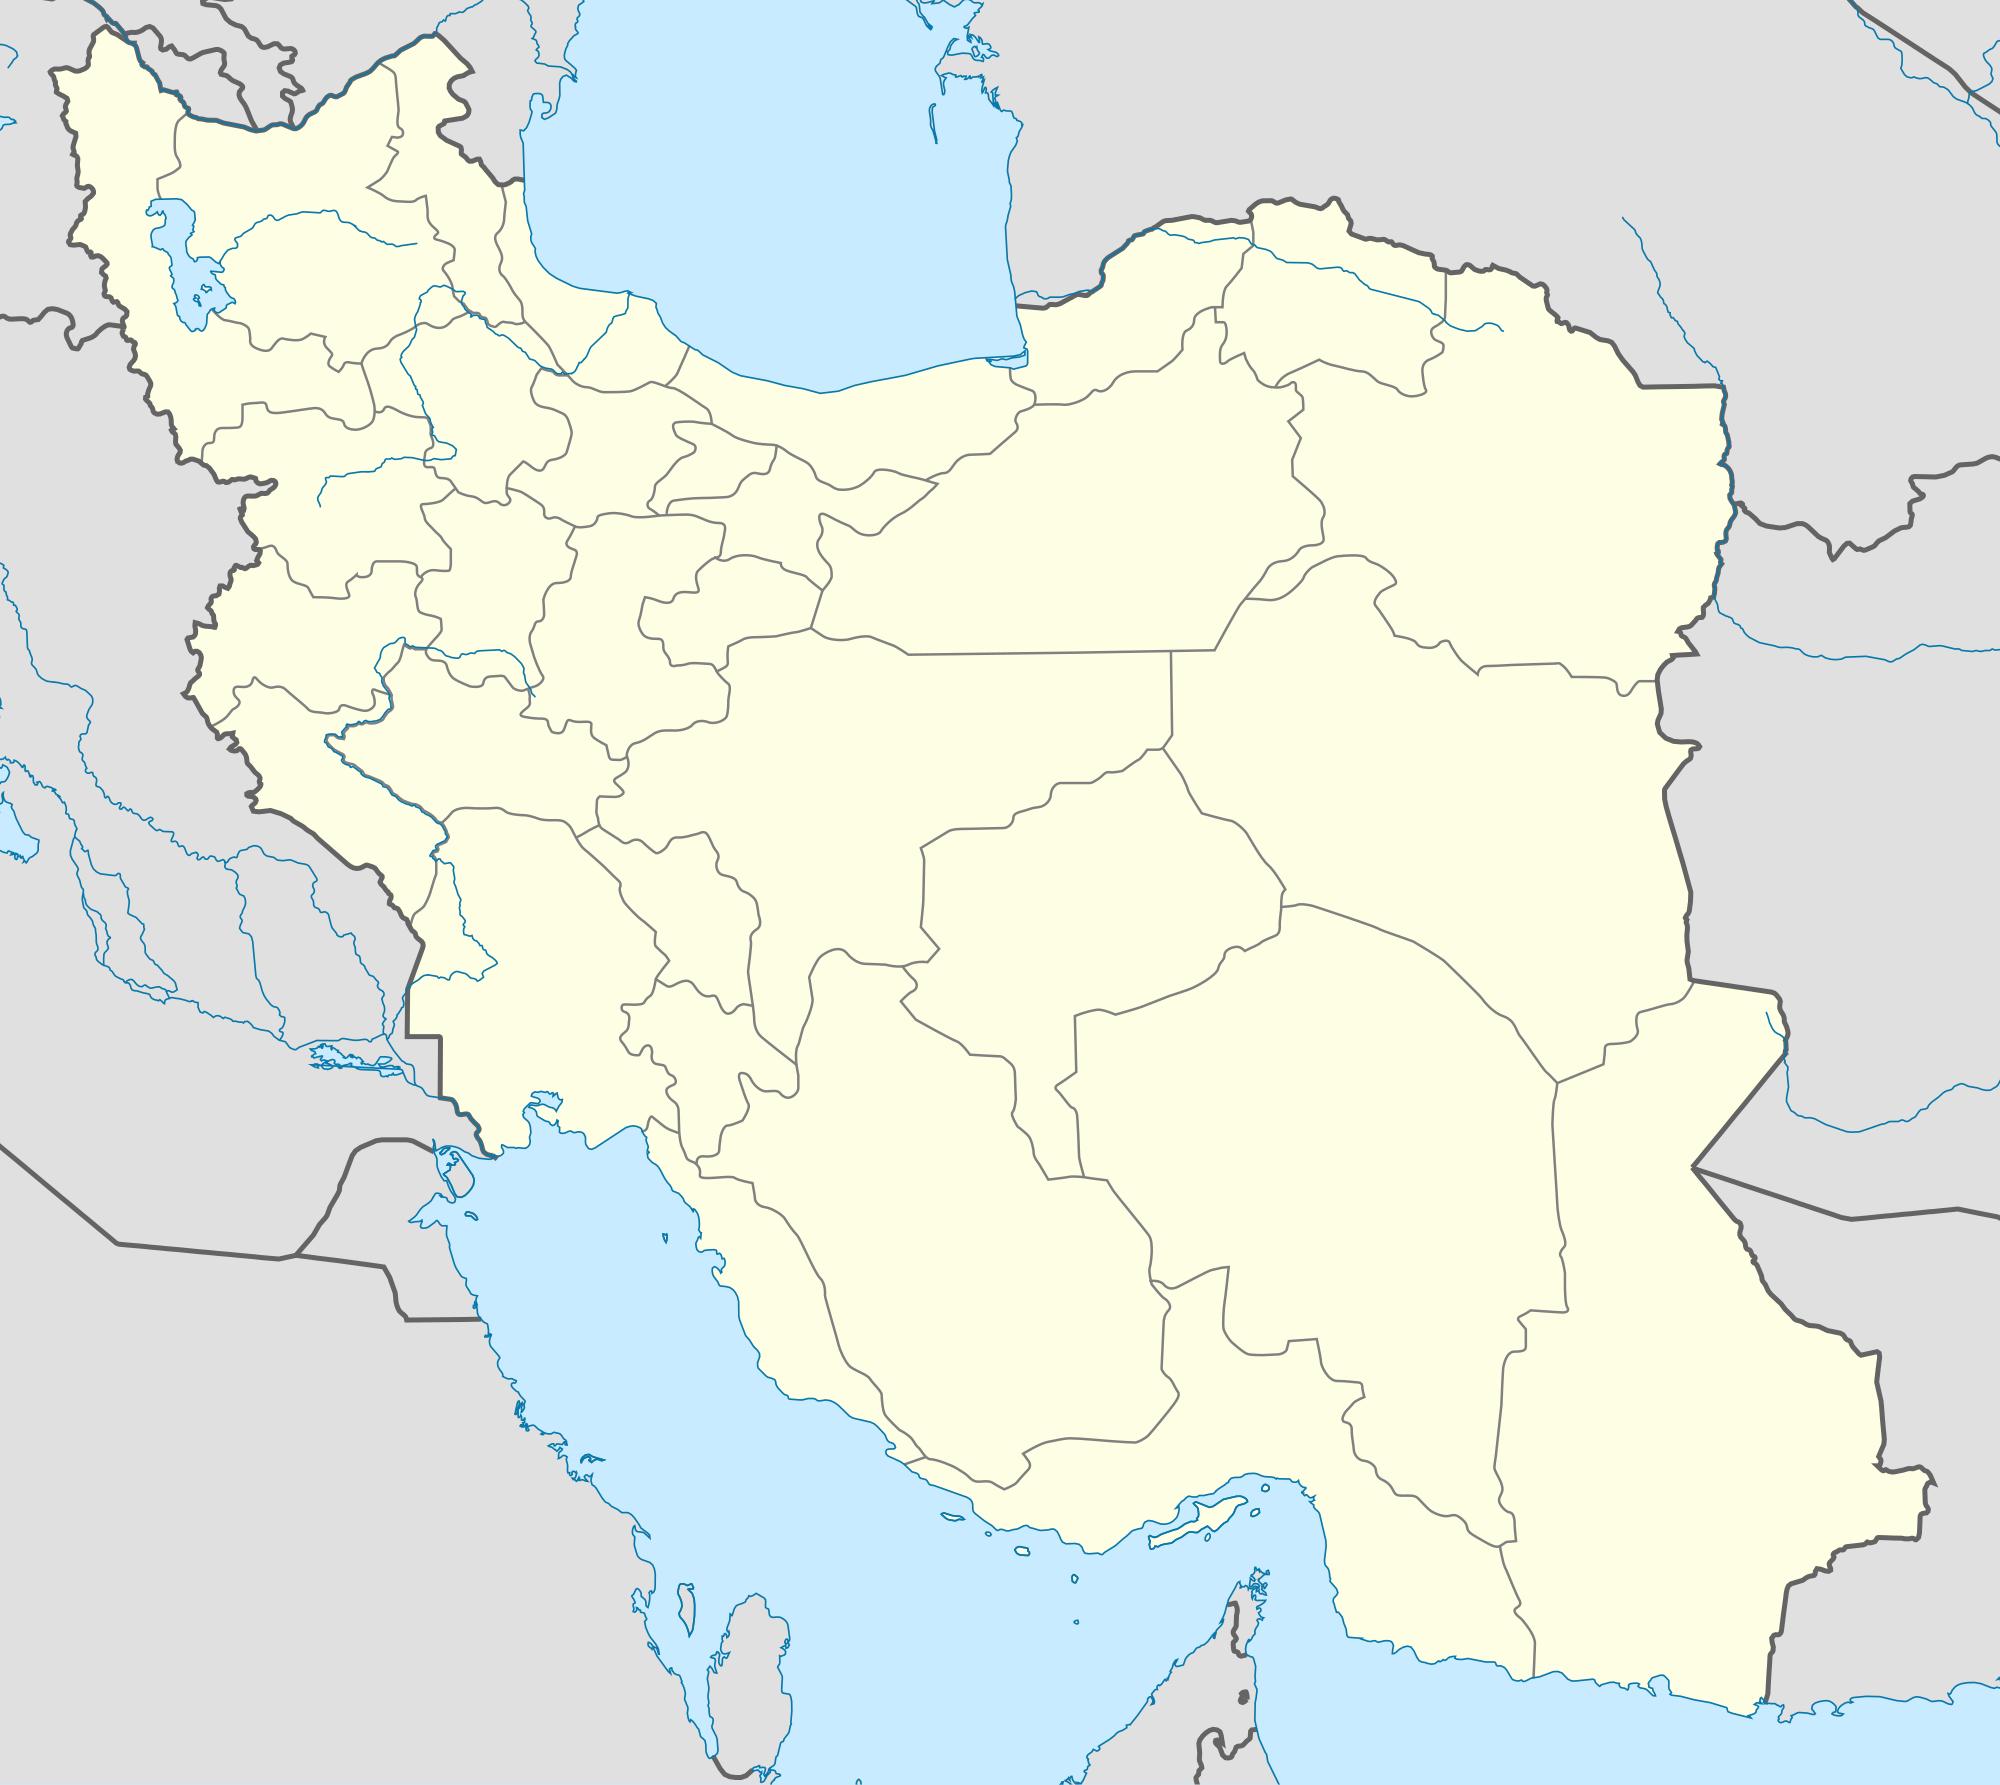 غرقآباد